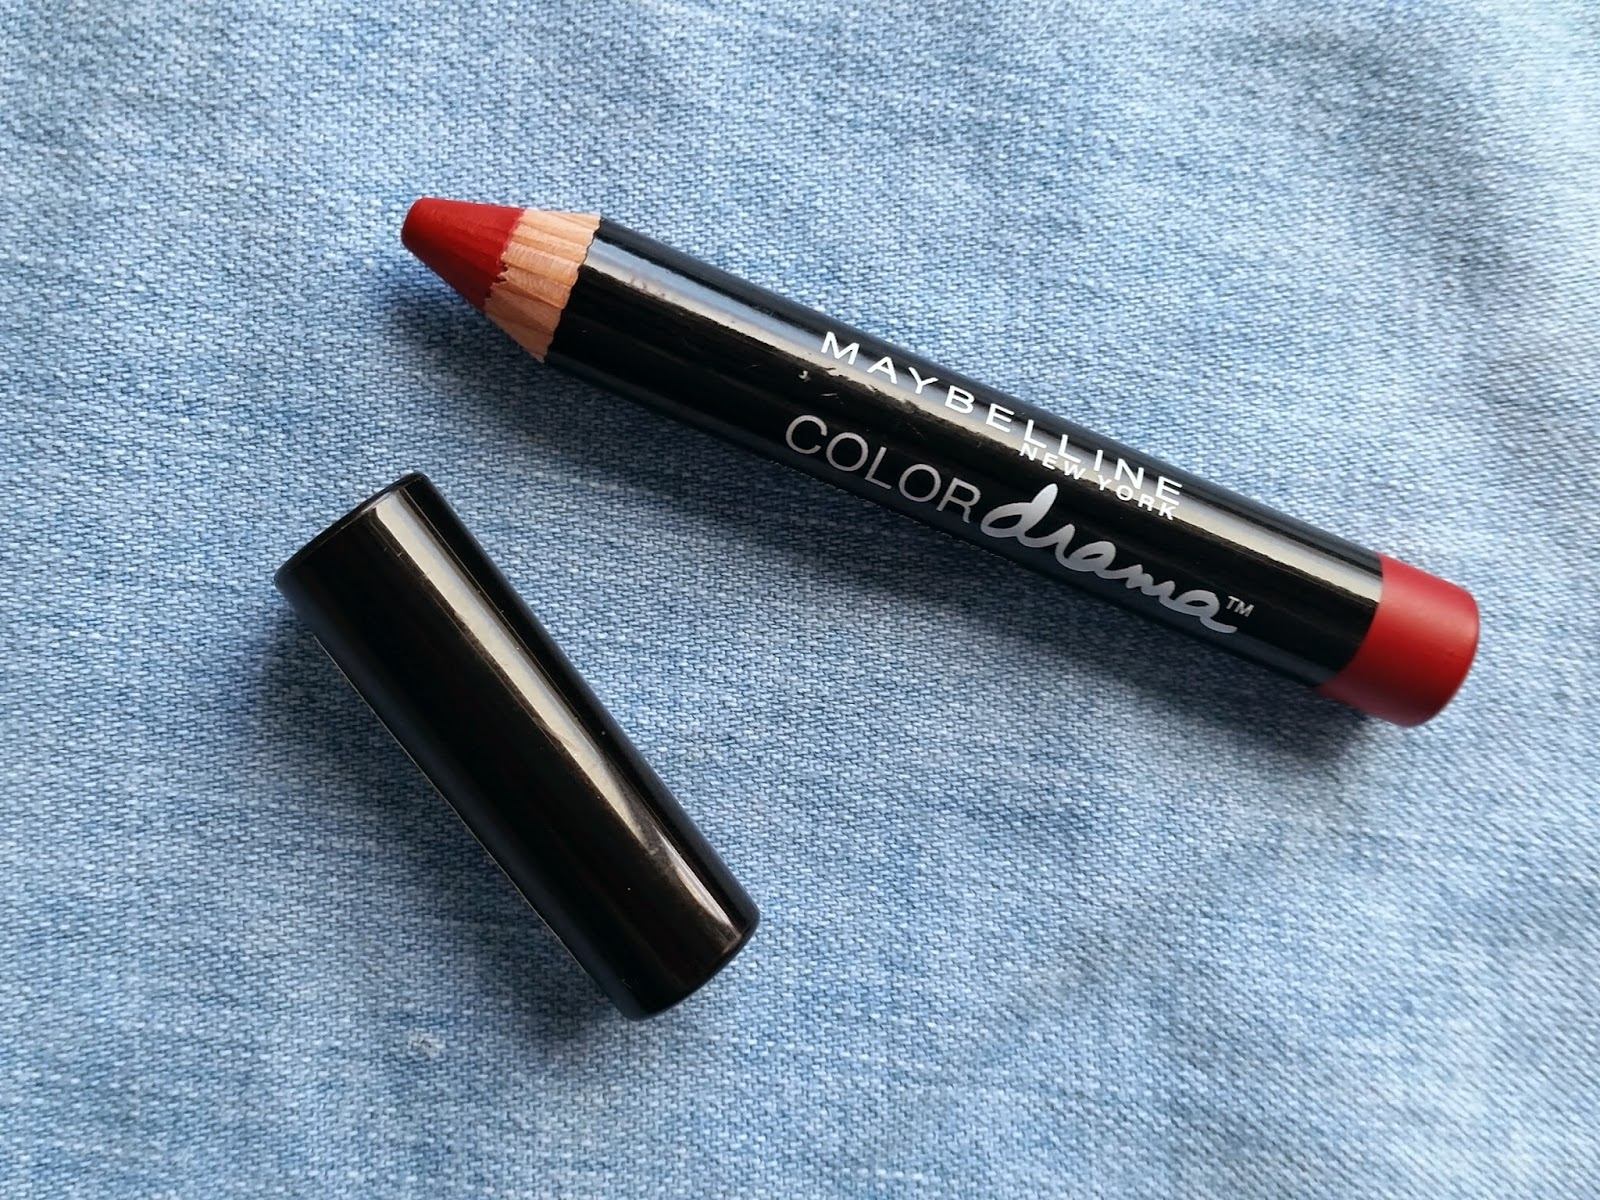 Maybelline Color Drama Velvet Lip Pencil